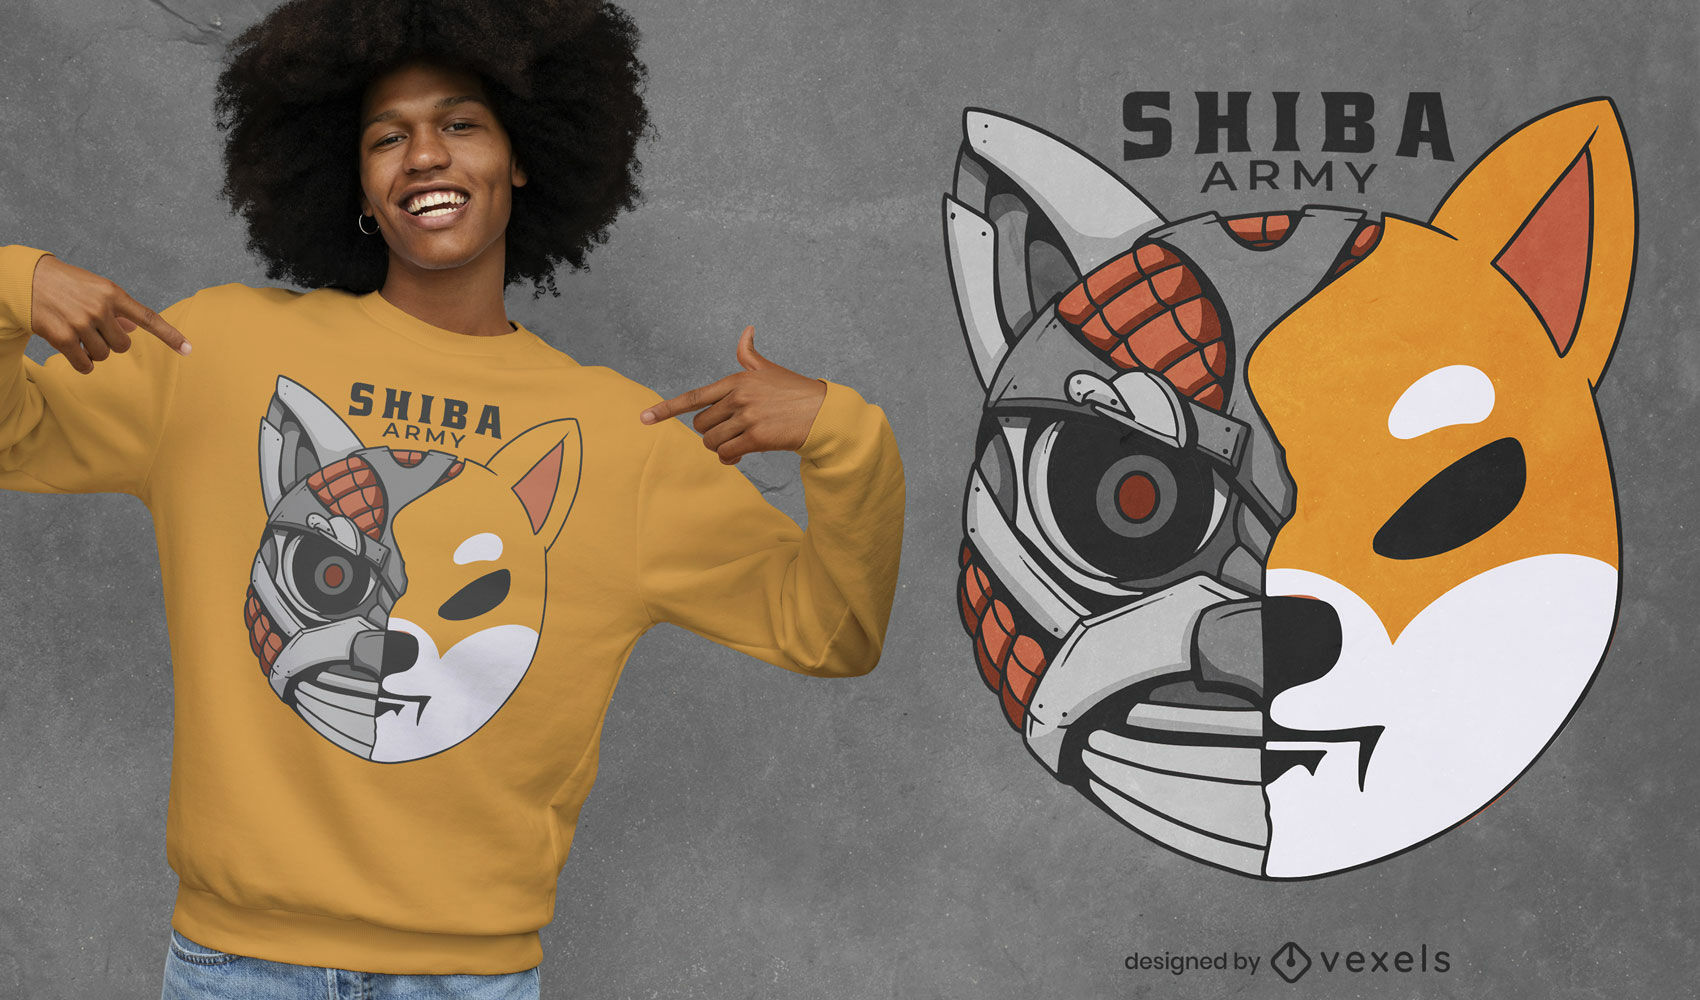 Shiba dog robot t-shirt design